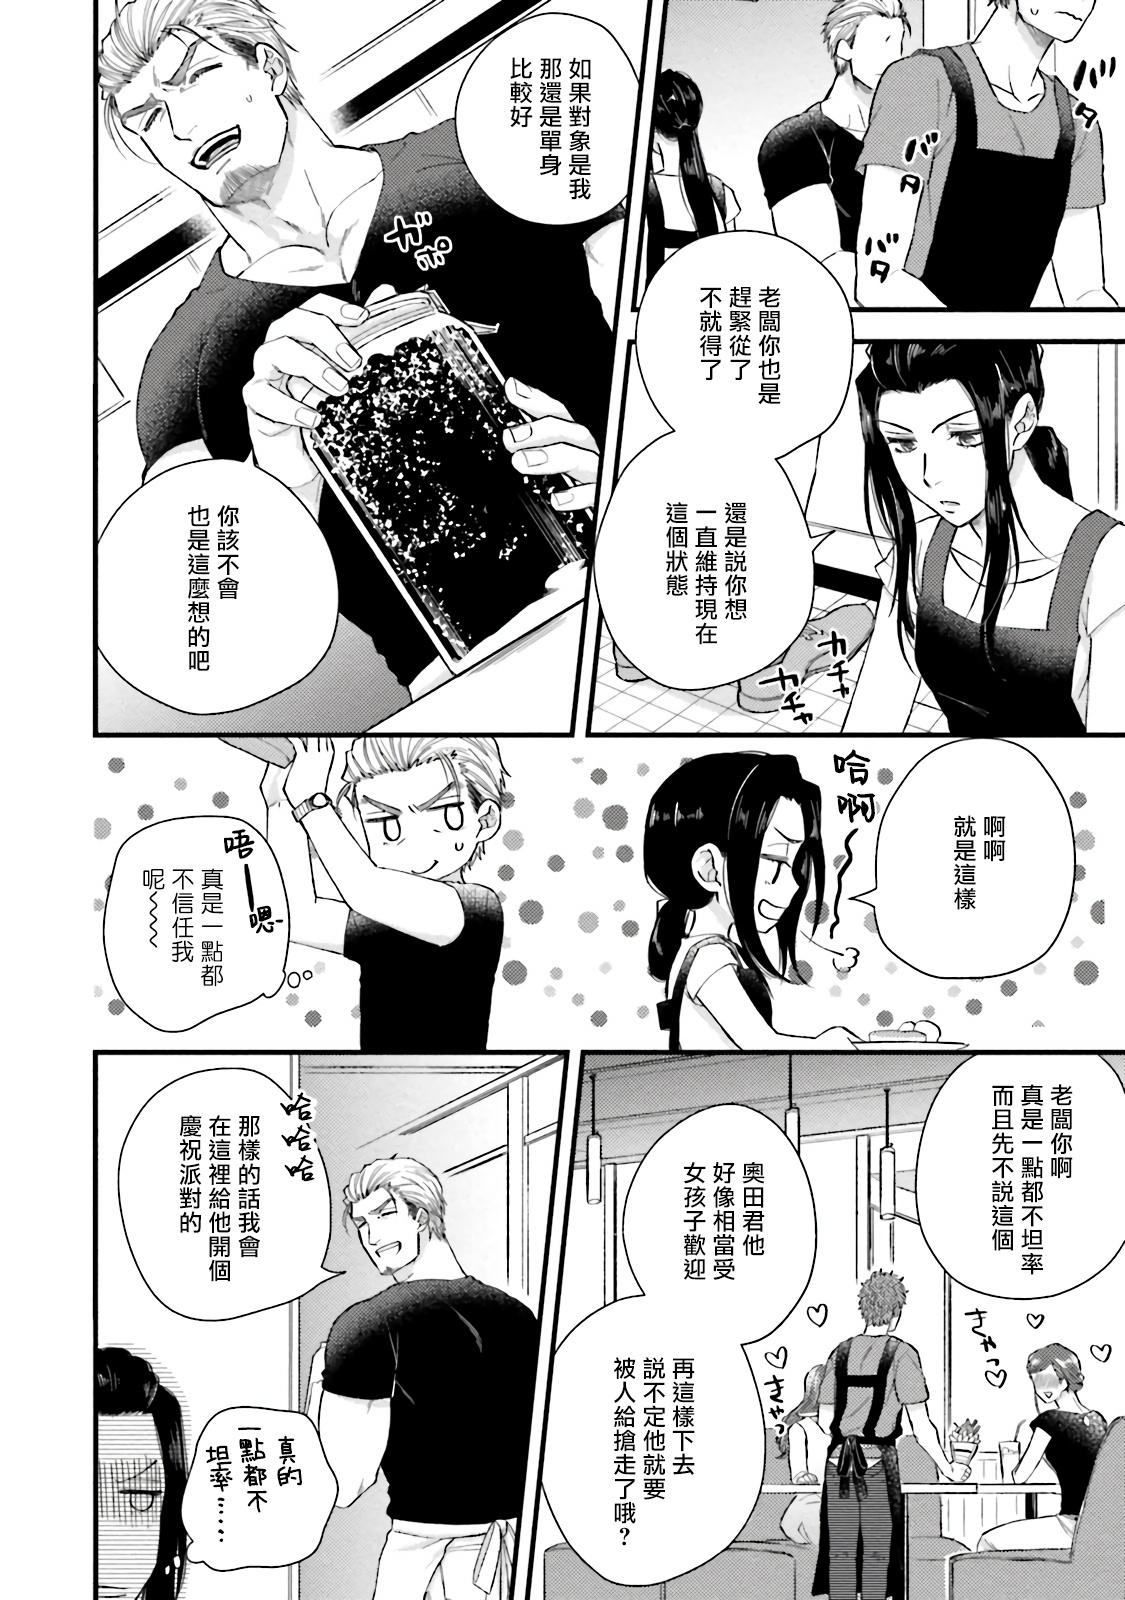 Kinou wa Otanoshimi Deshita ne | 昨天过得很愉快吧 Ch. 1-4+特典 52